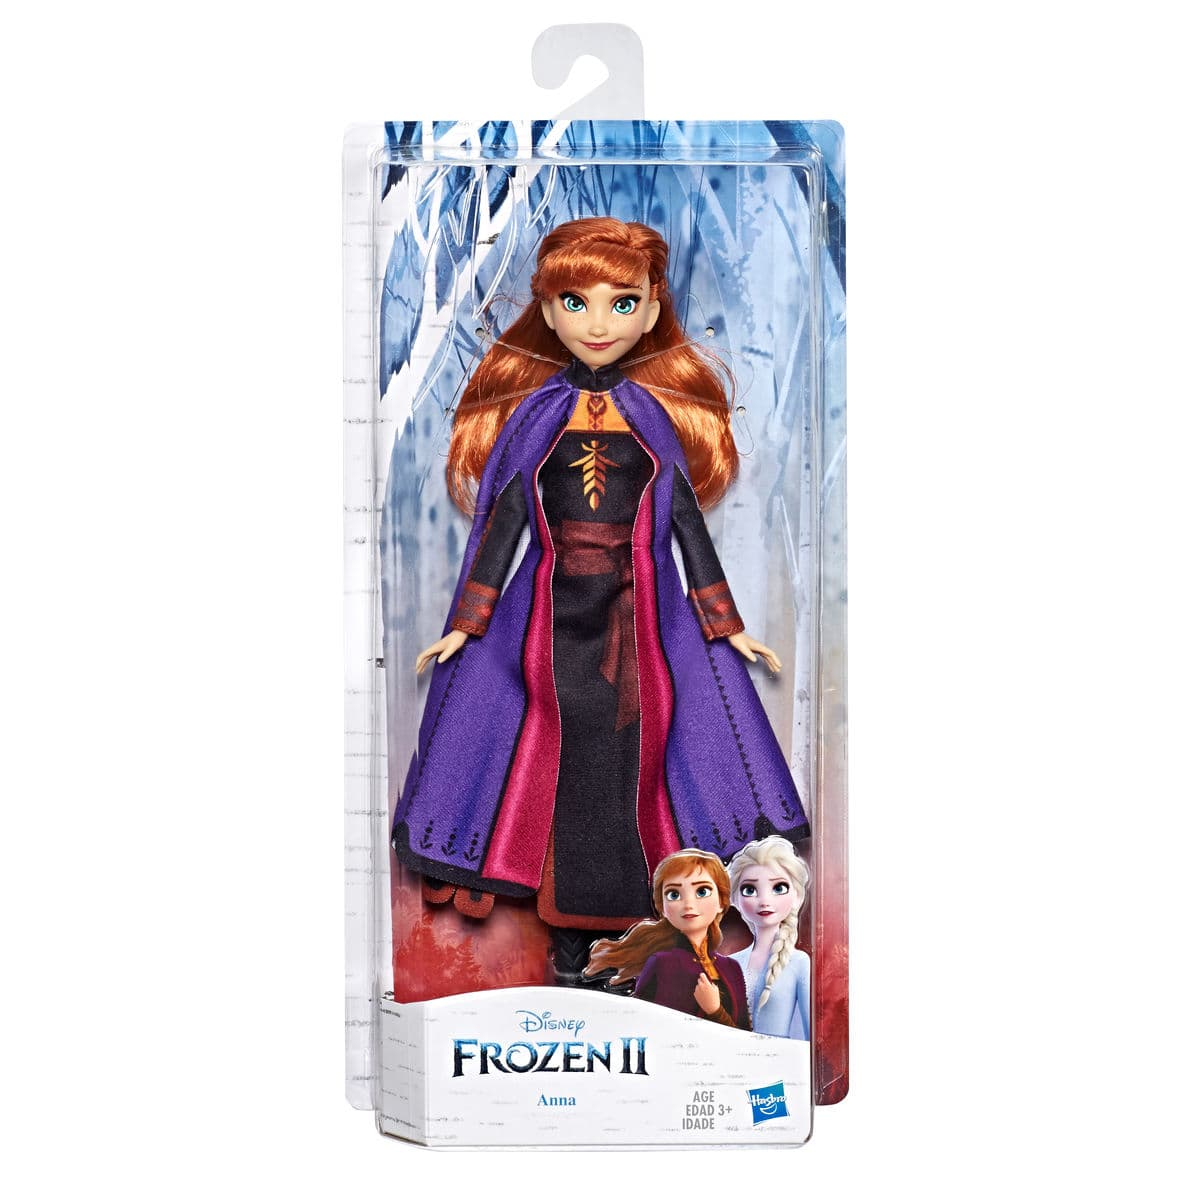 Disney Frozen II Anna Puppe mit Outfit Puppe